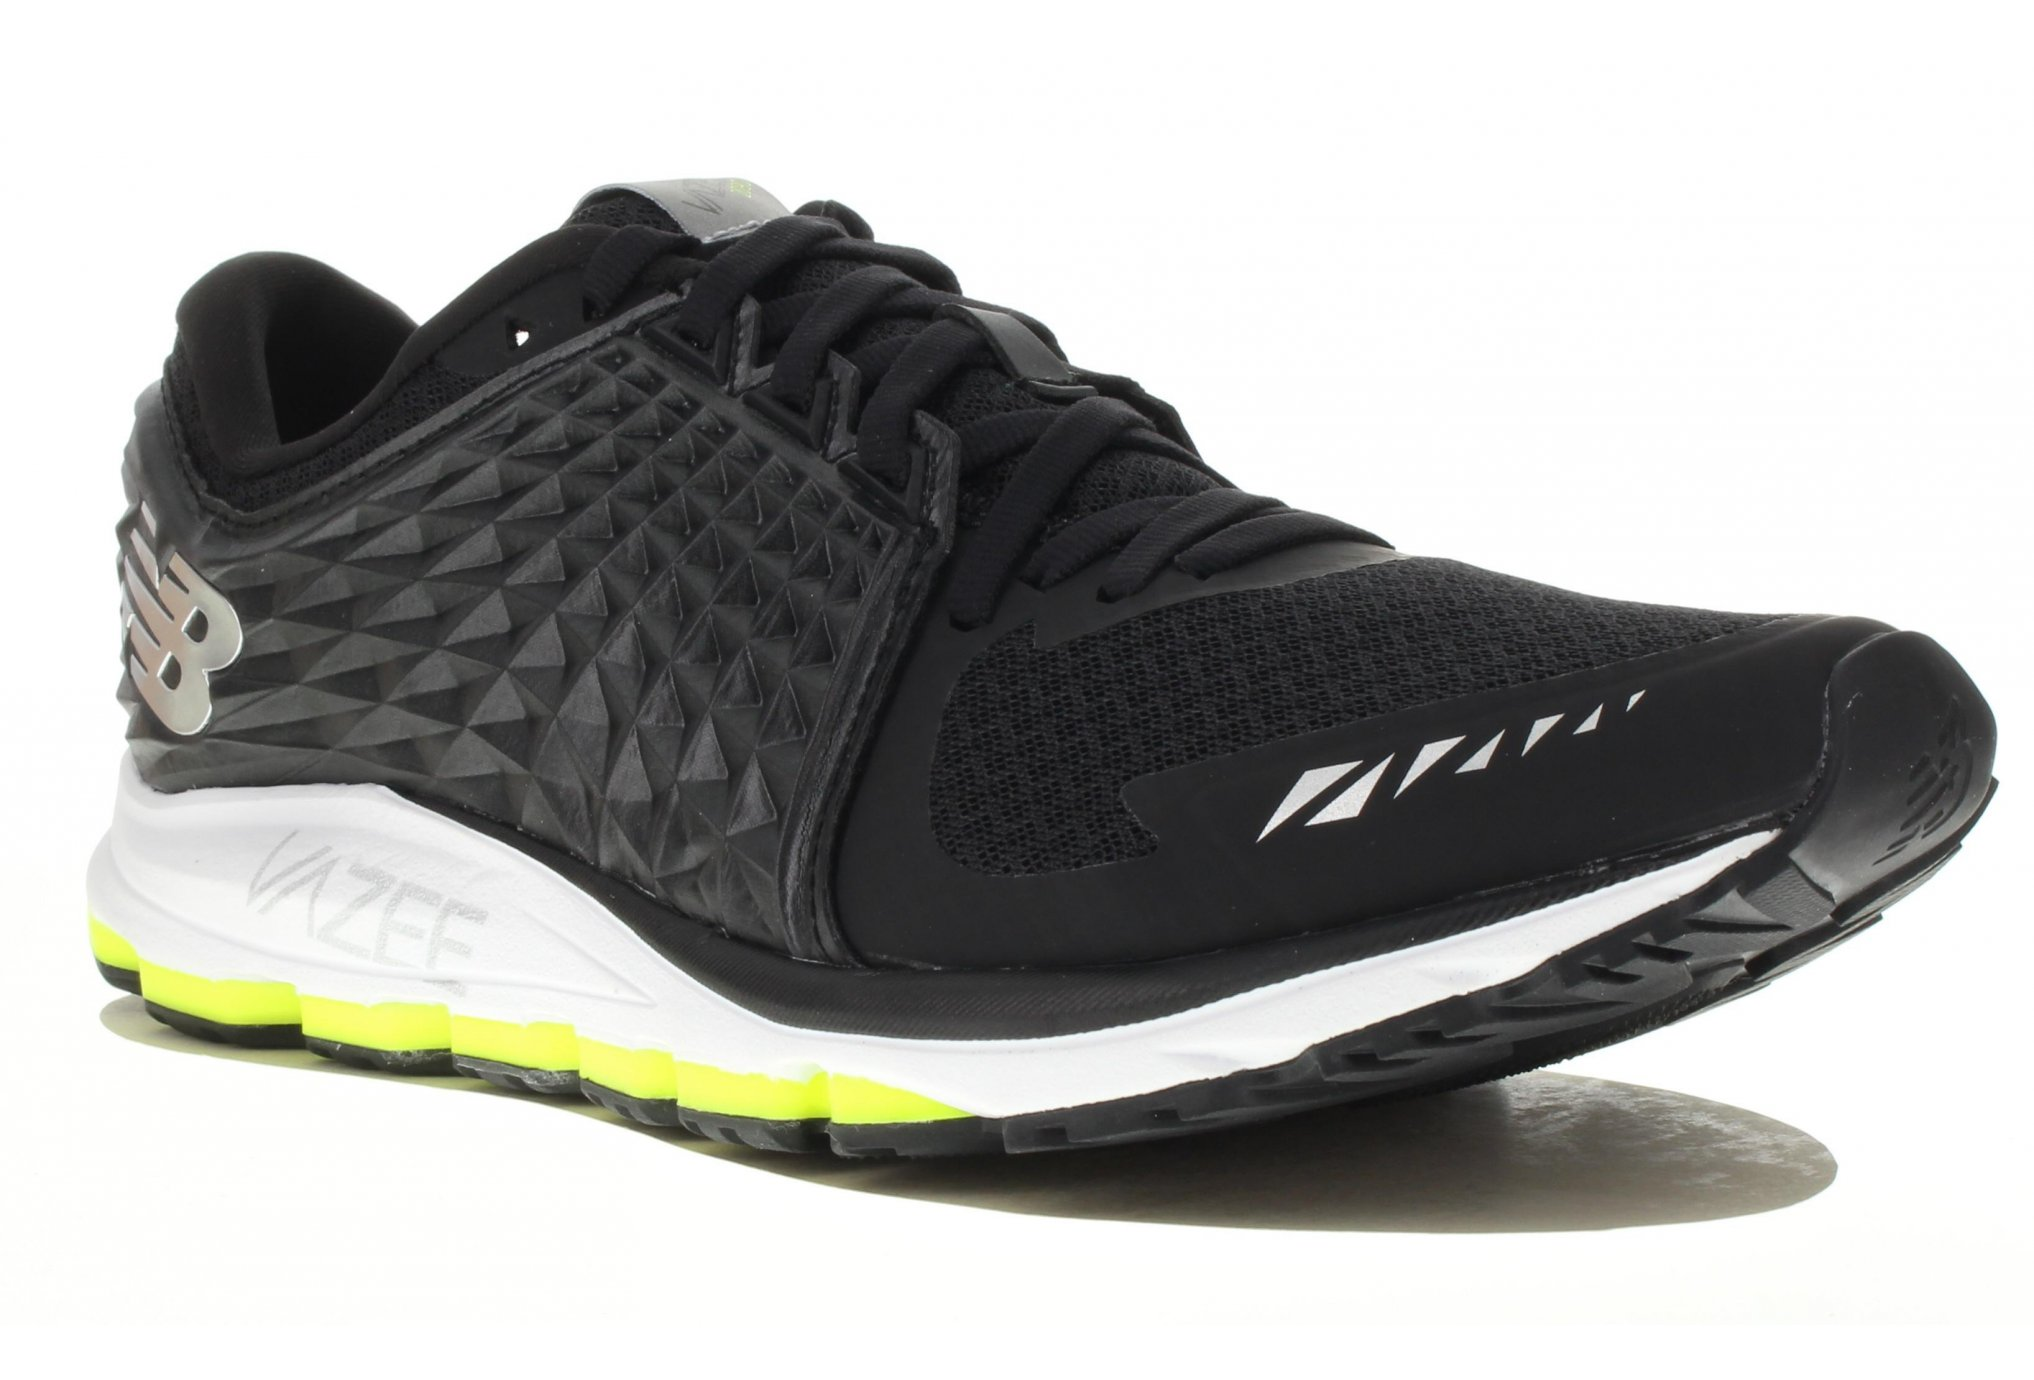 Homme New Cher Chaussures Balance Vazee Pas M 2090 wwAxUcq0